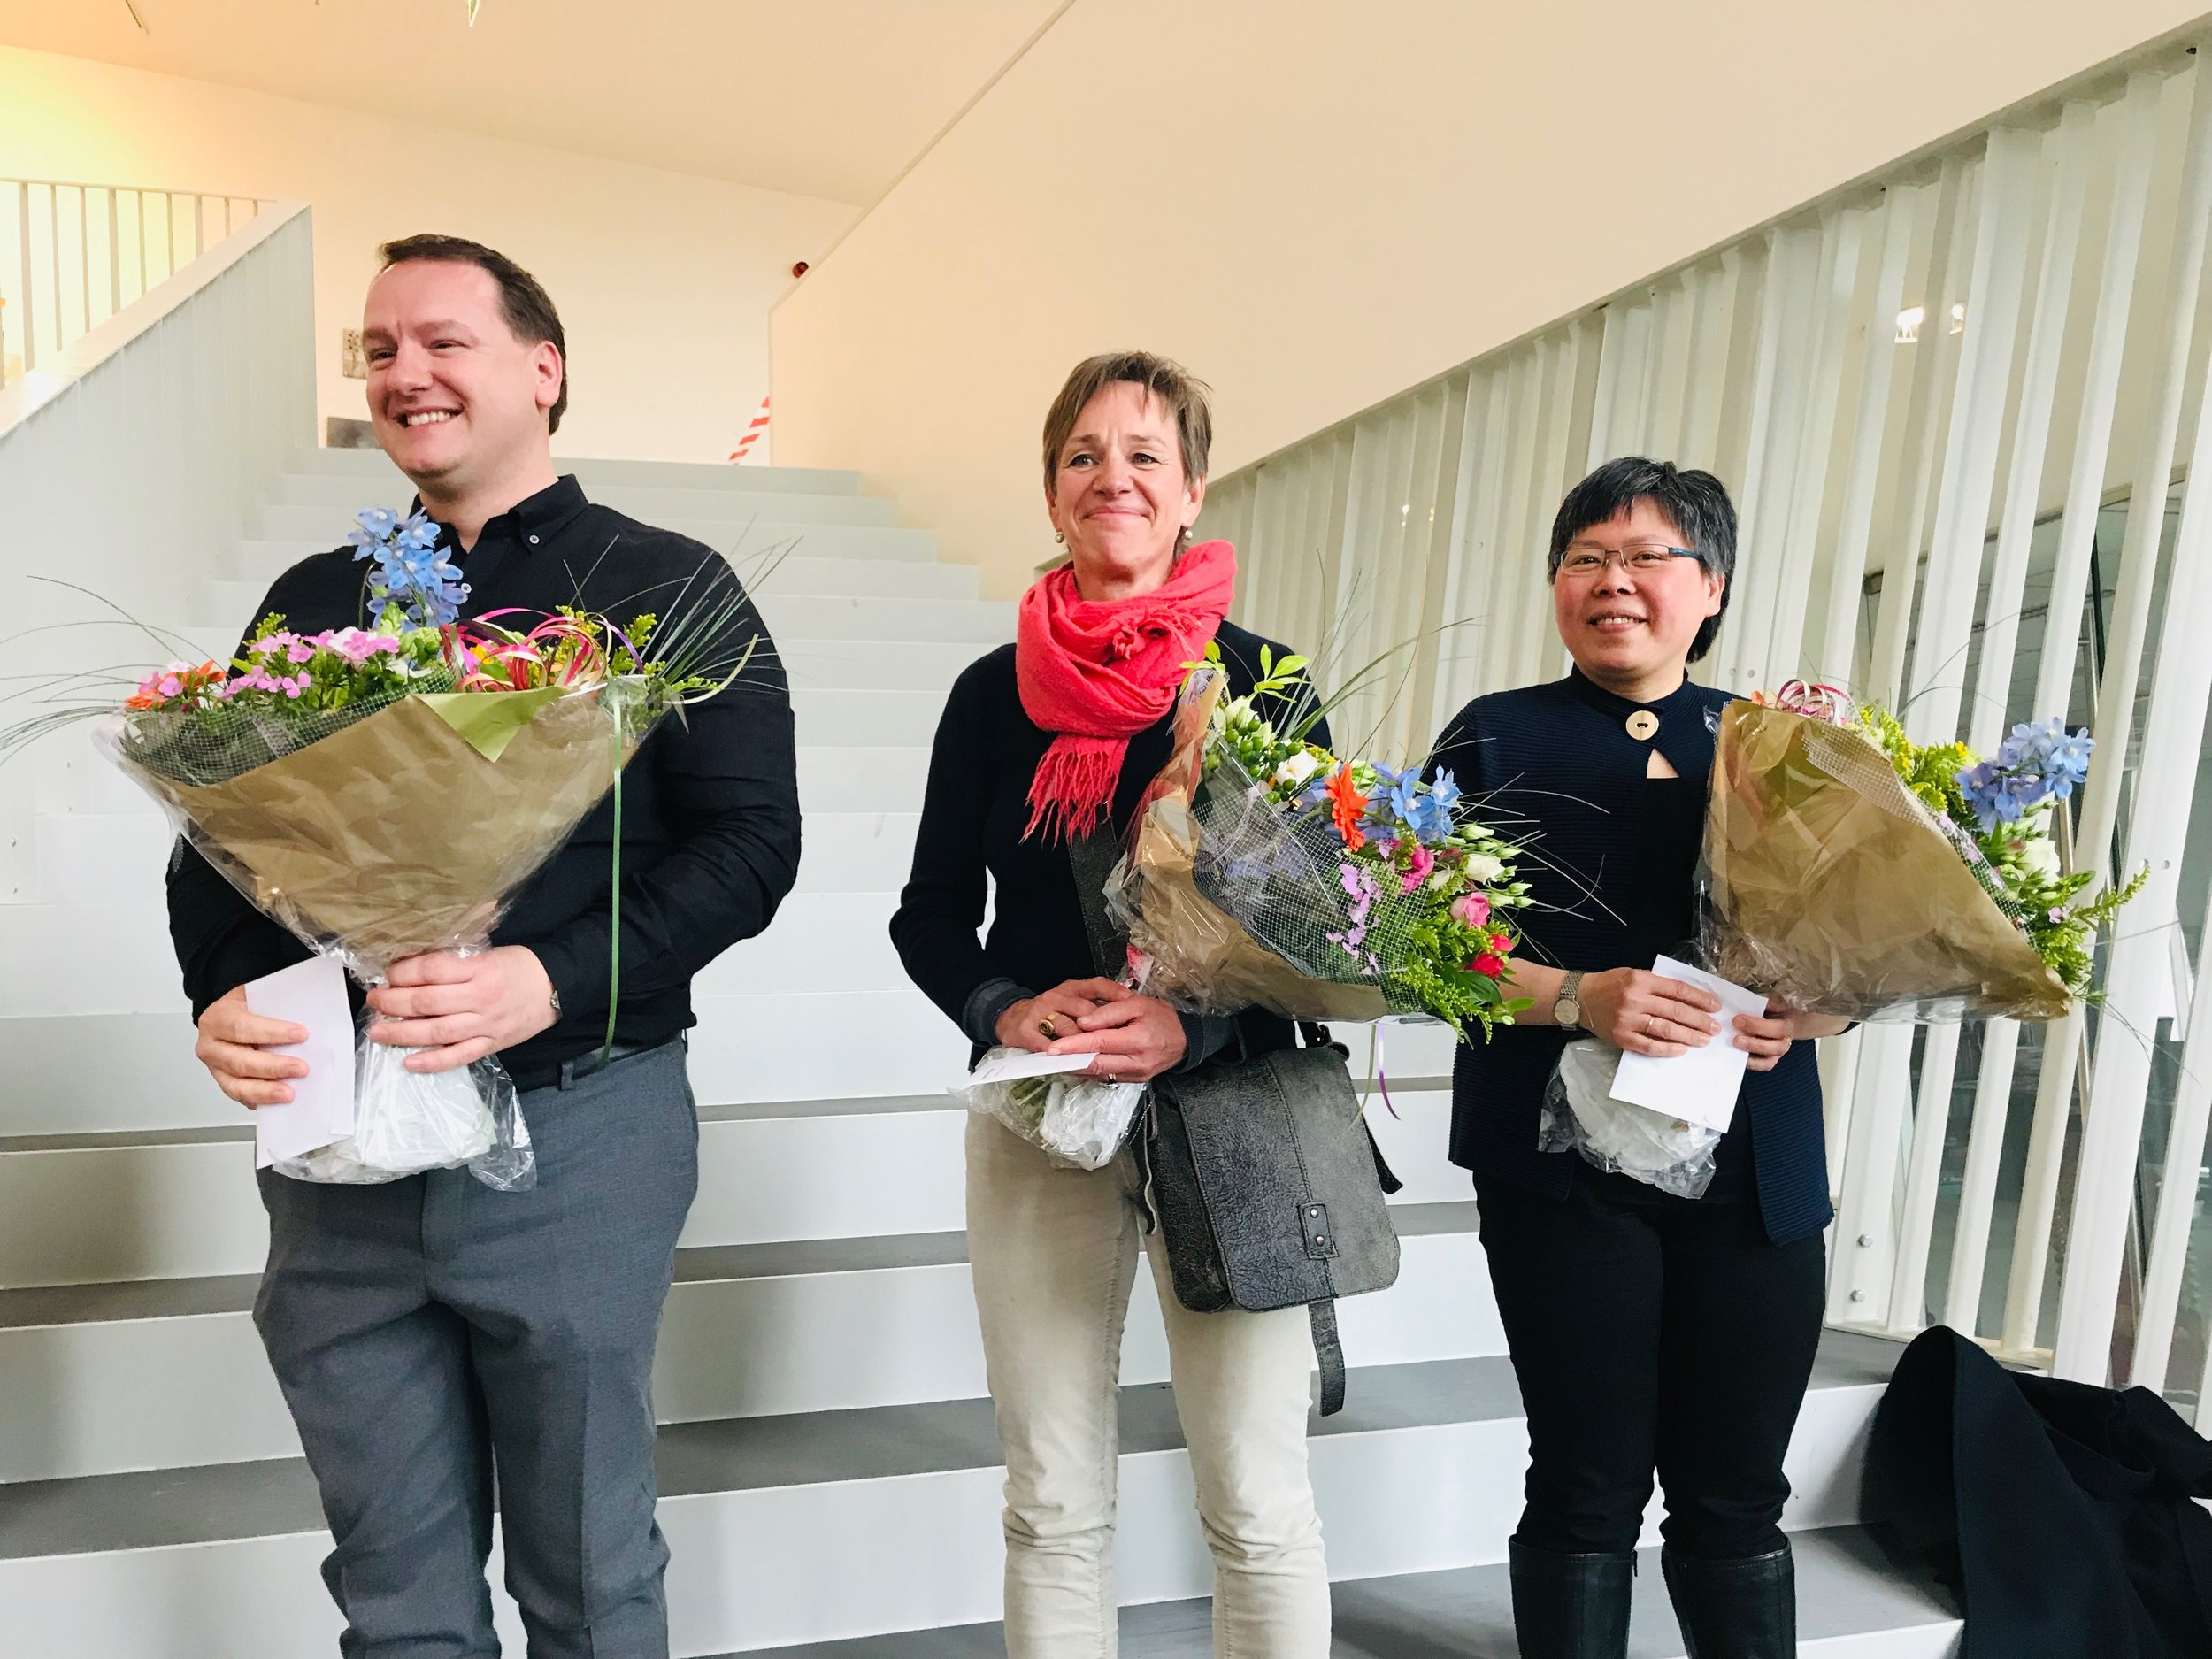 De drie winnaars: Johannes Bosgra, Martina Hladikova & Melda Wibawa